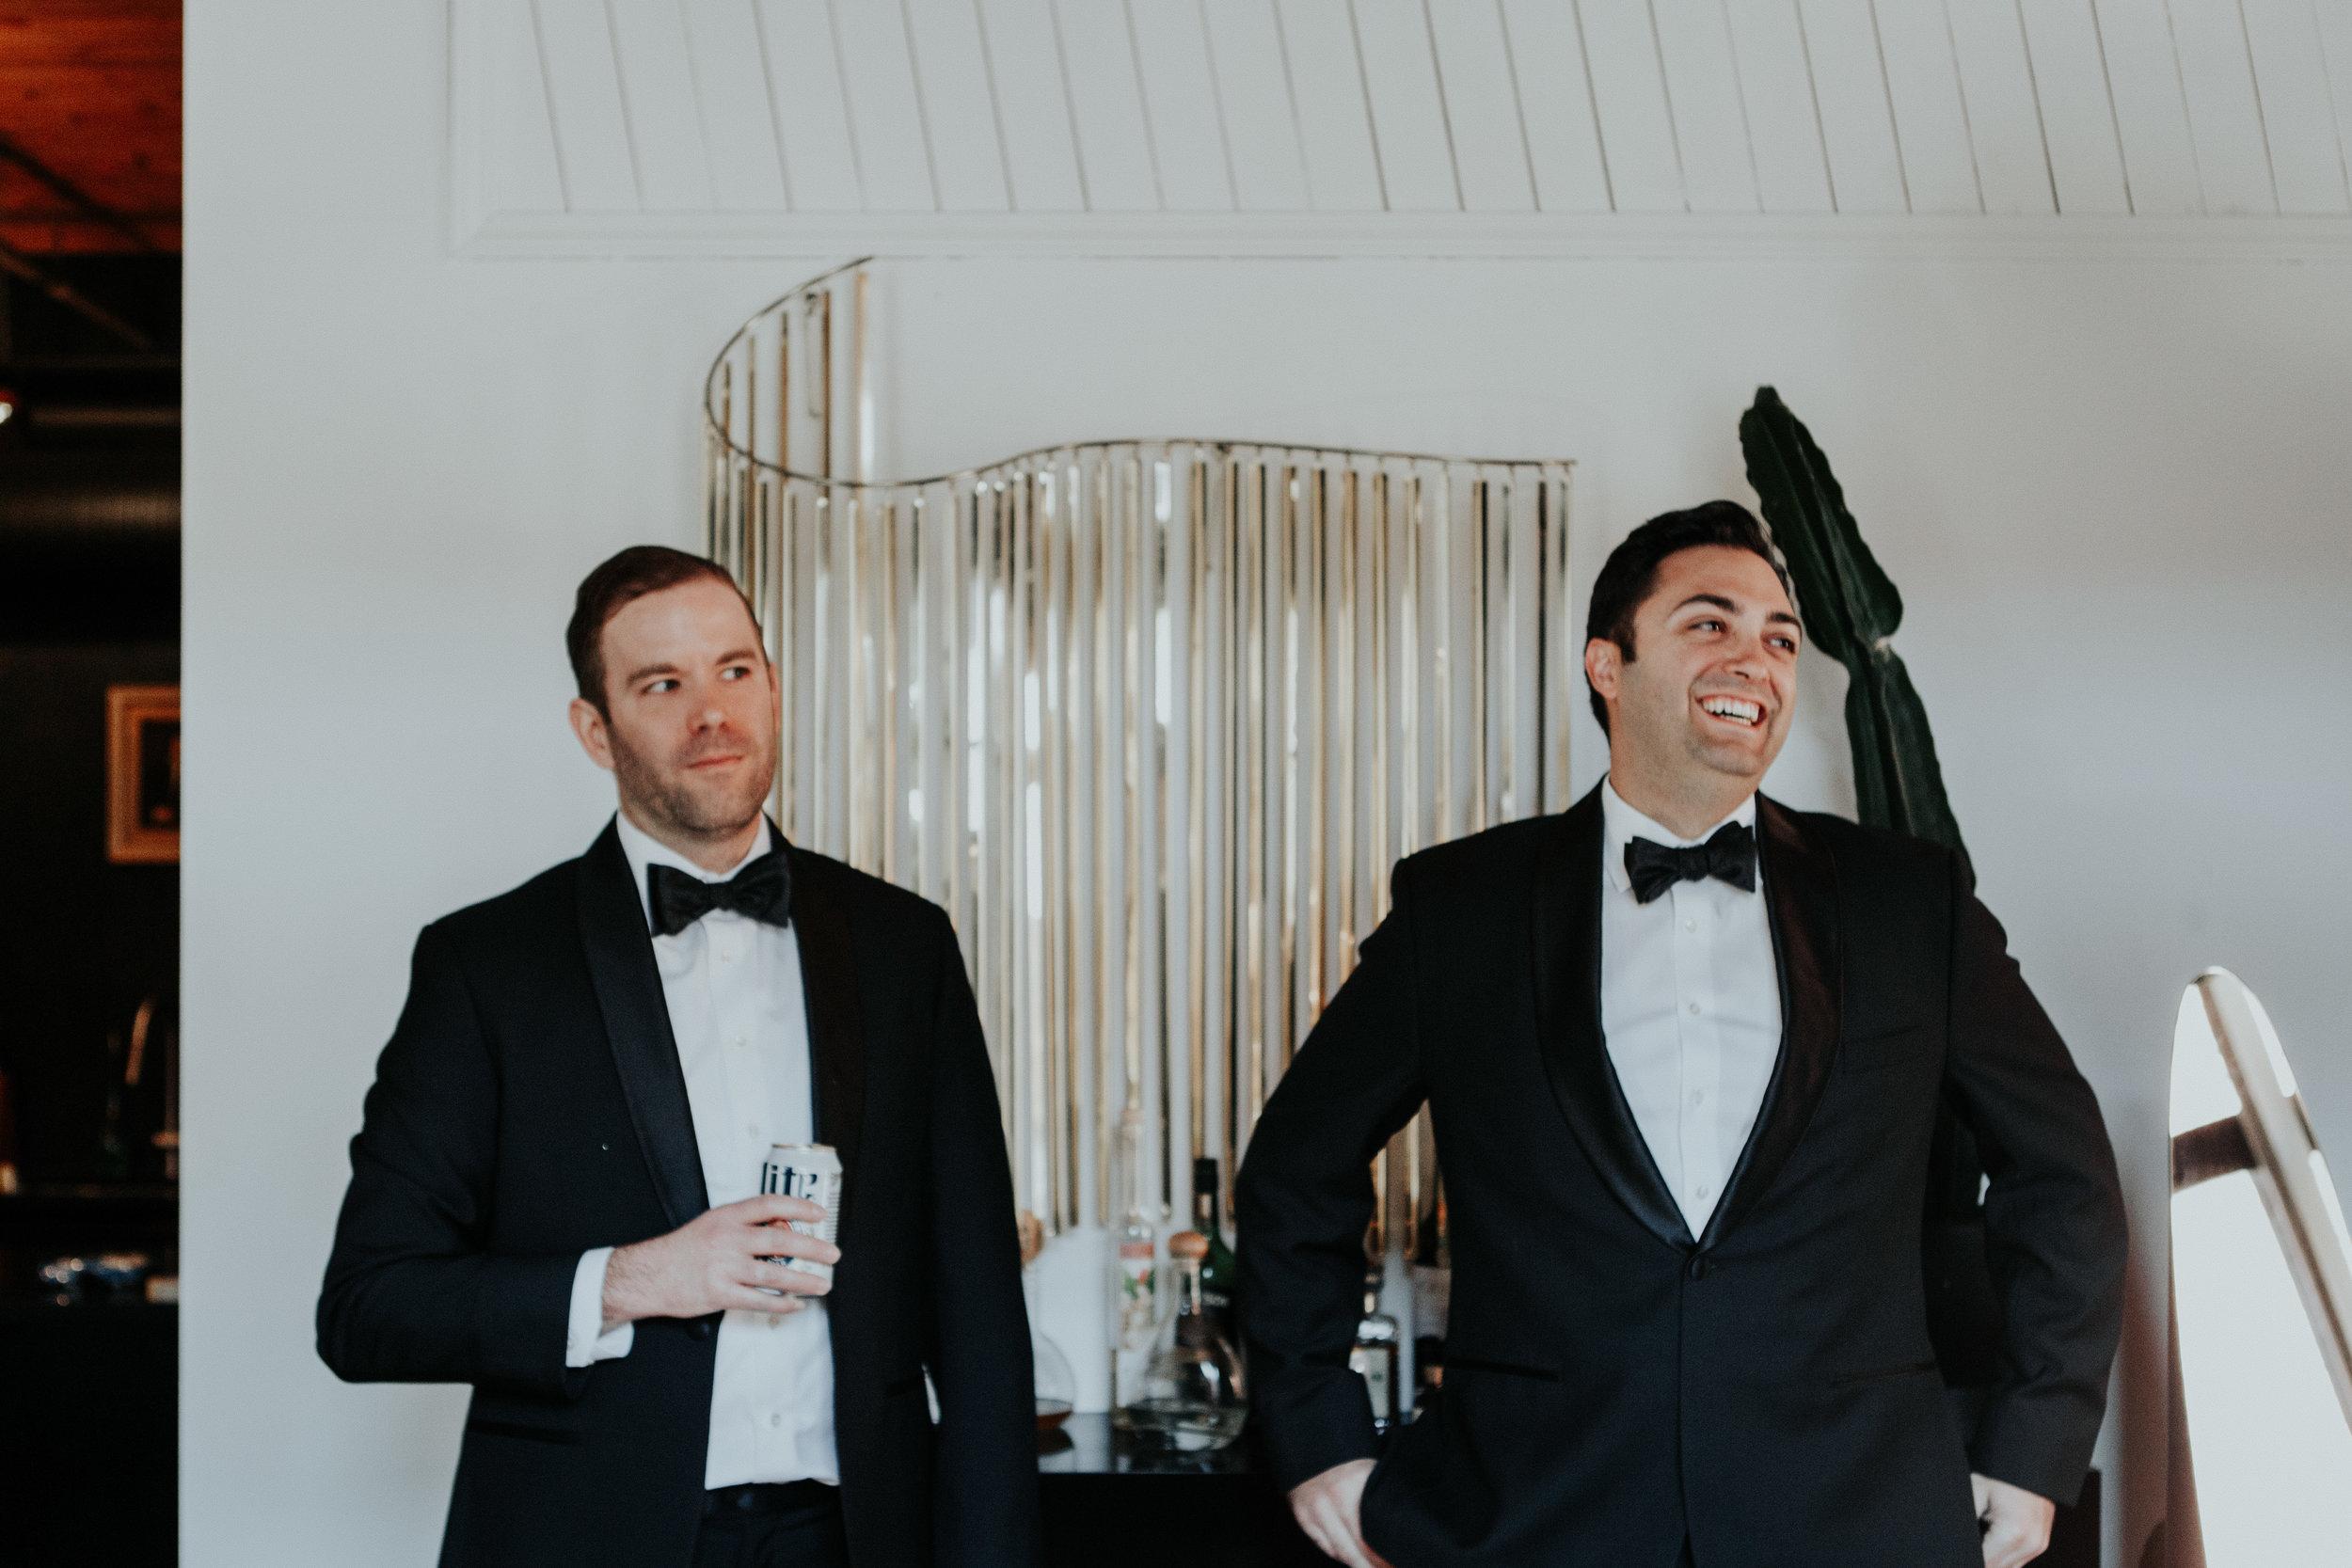 intimate wedding photography chicago illinois